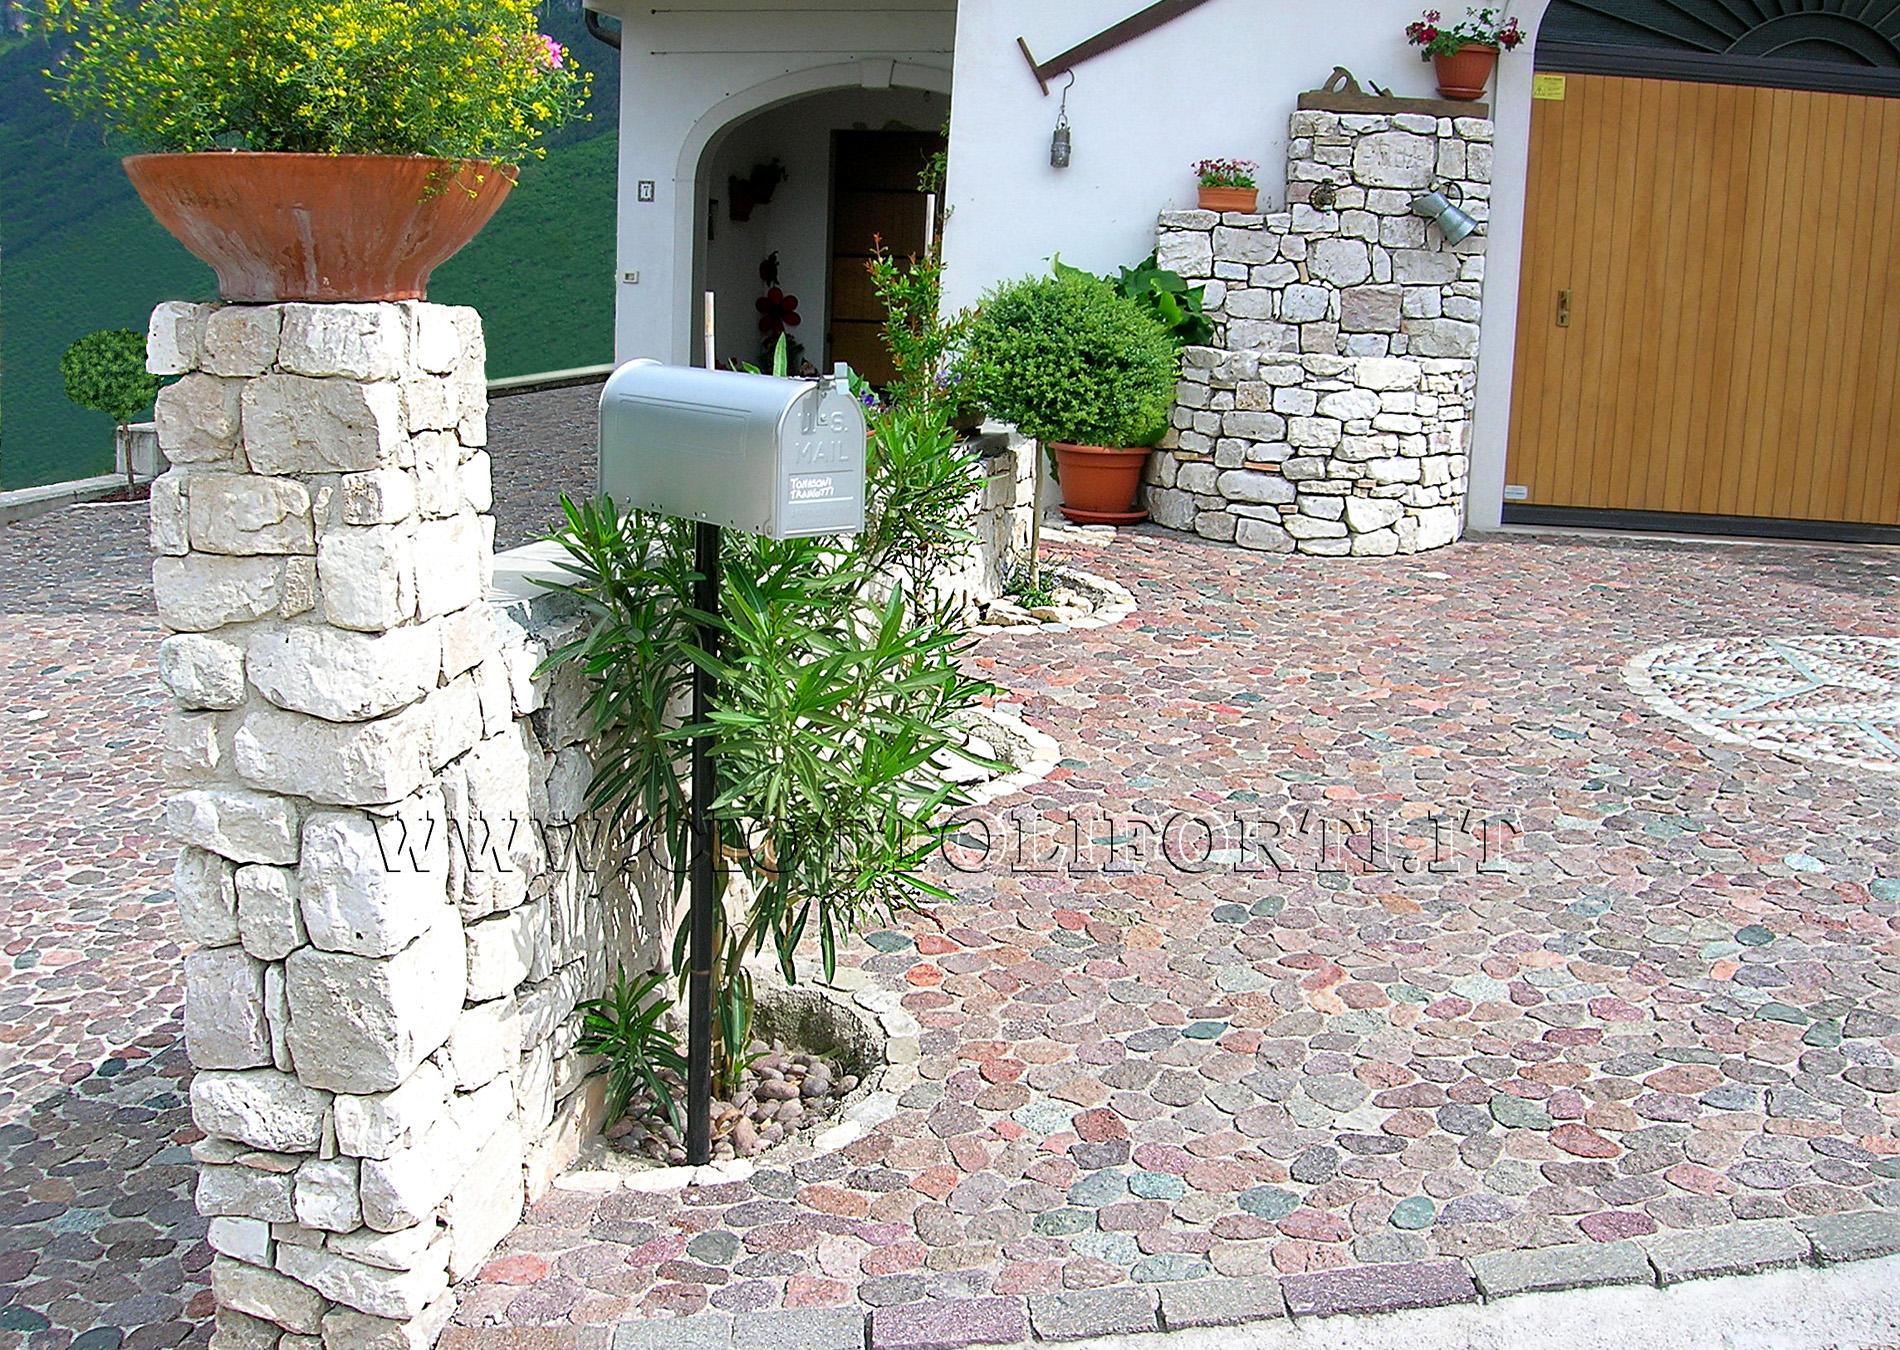 Vendita sassi da giardino verona giardino castelli for Sassi da giardino obi